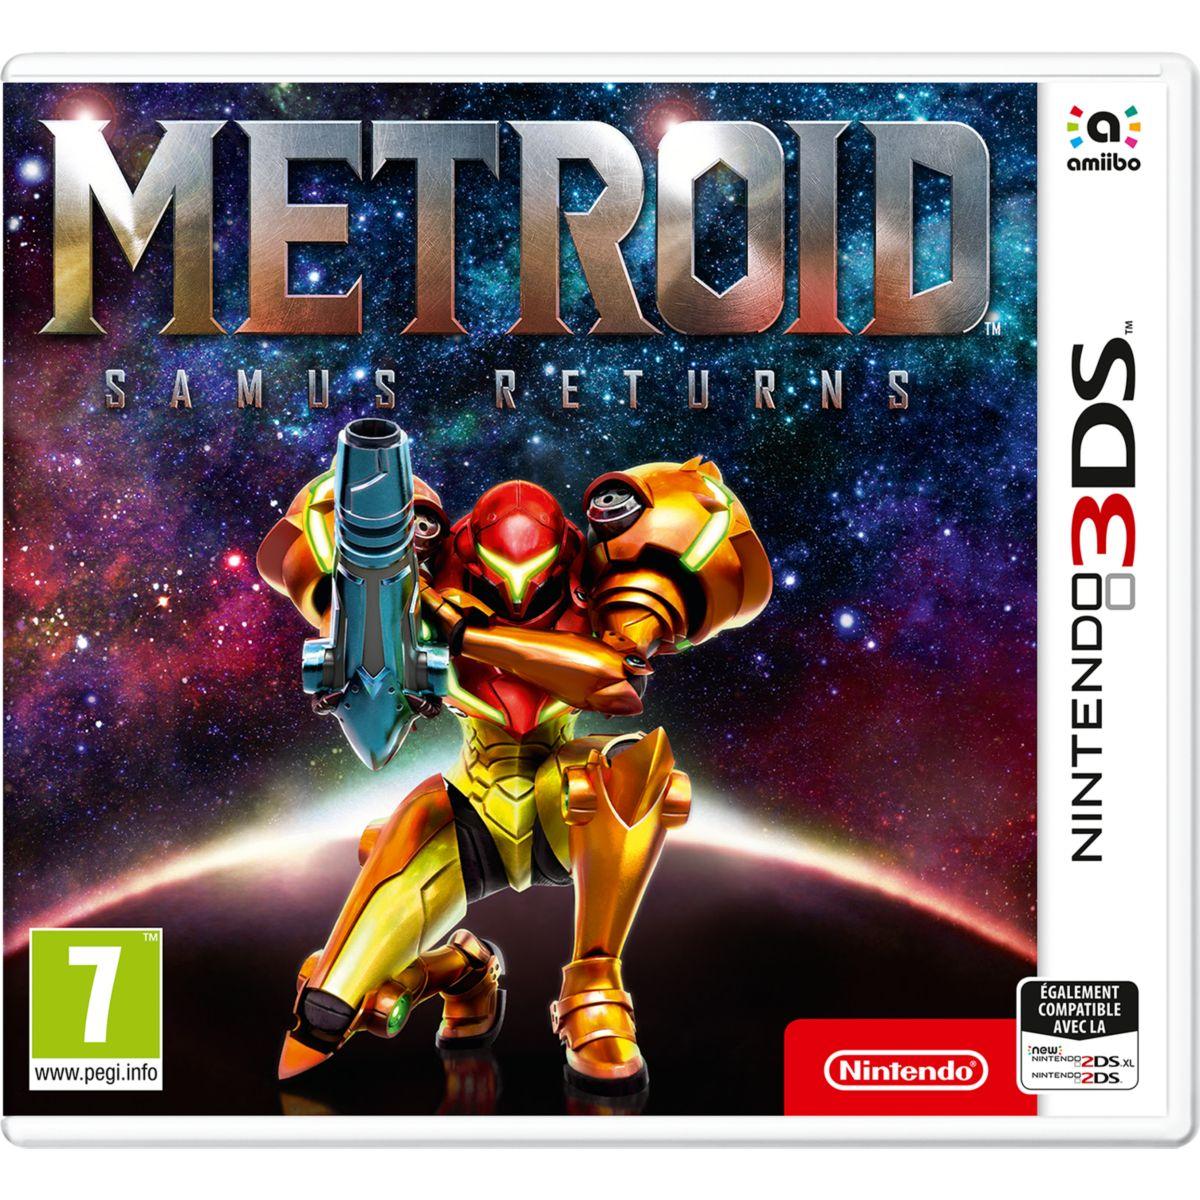 Jeu 3DS NINTENDO Metroid Samus Returns (photo)